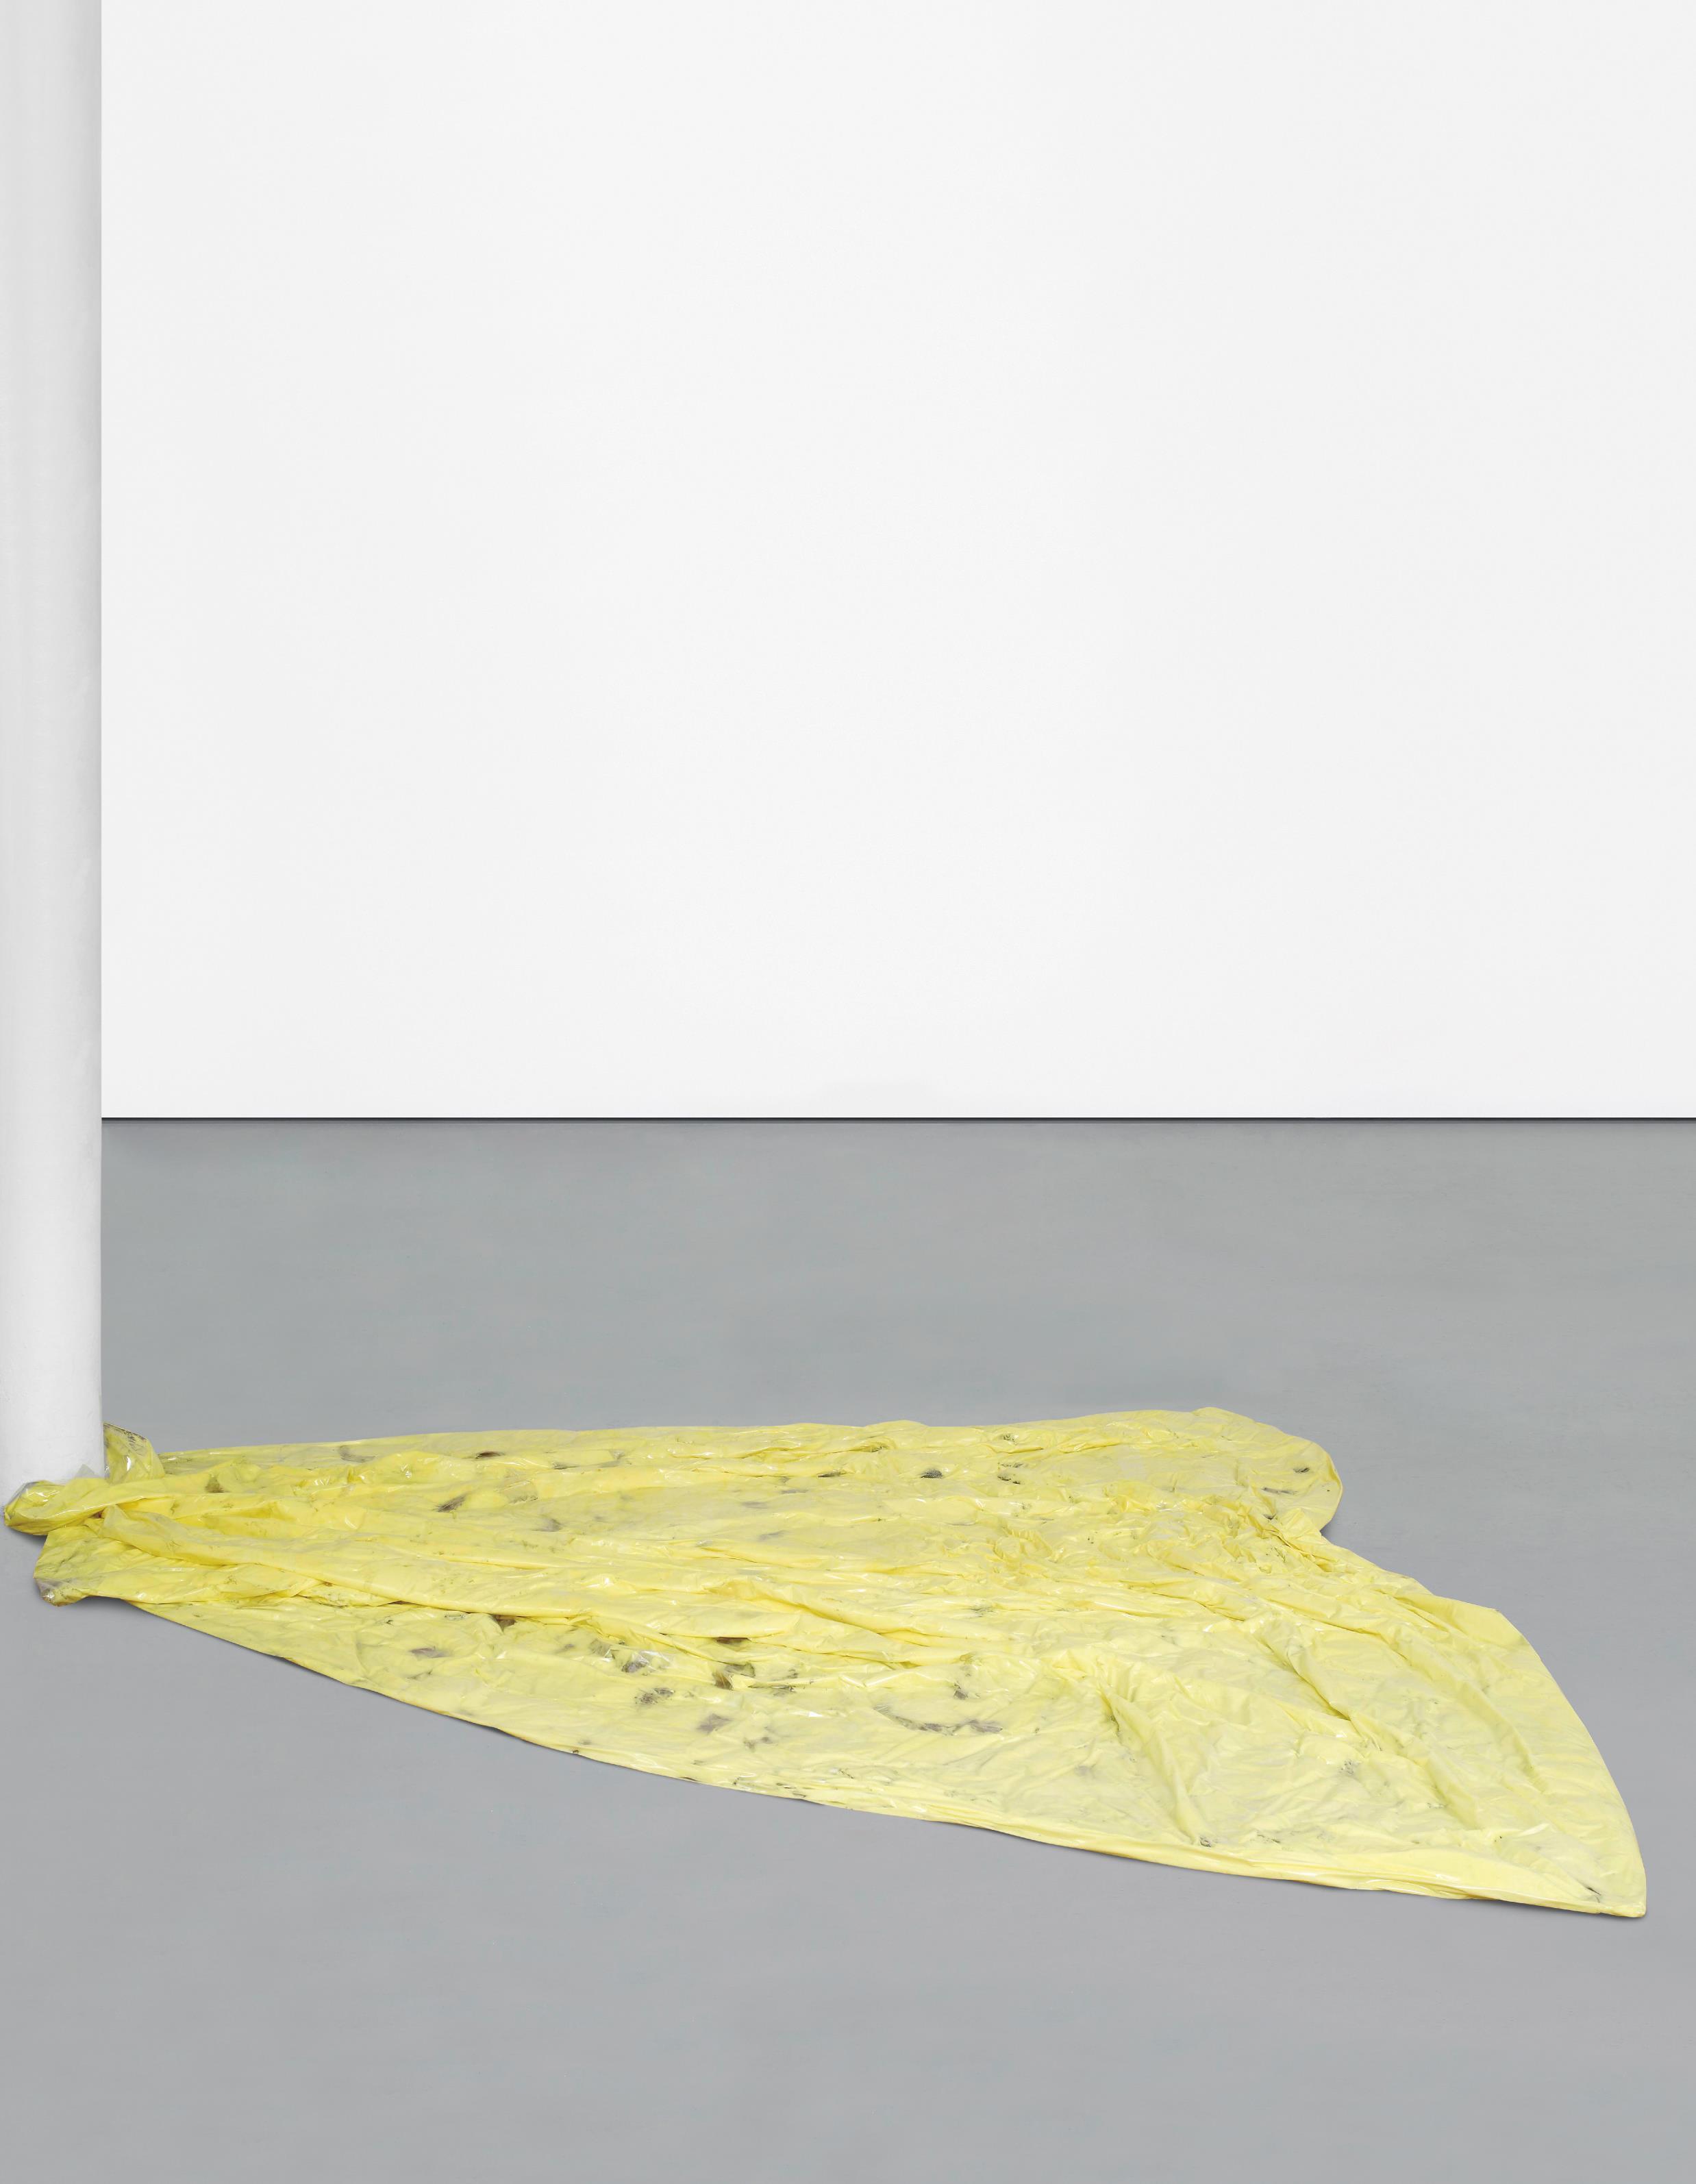 Karla Black-For Use-2009